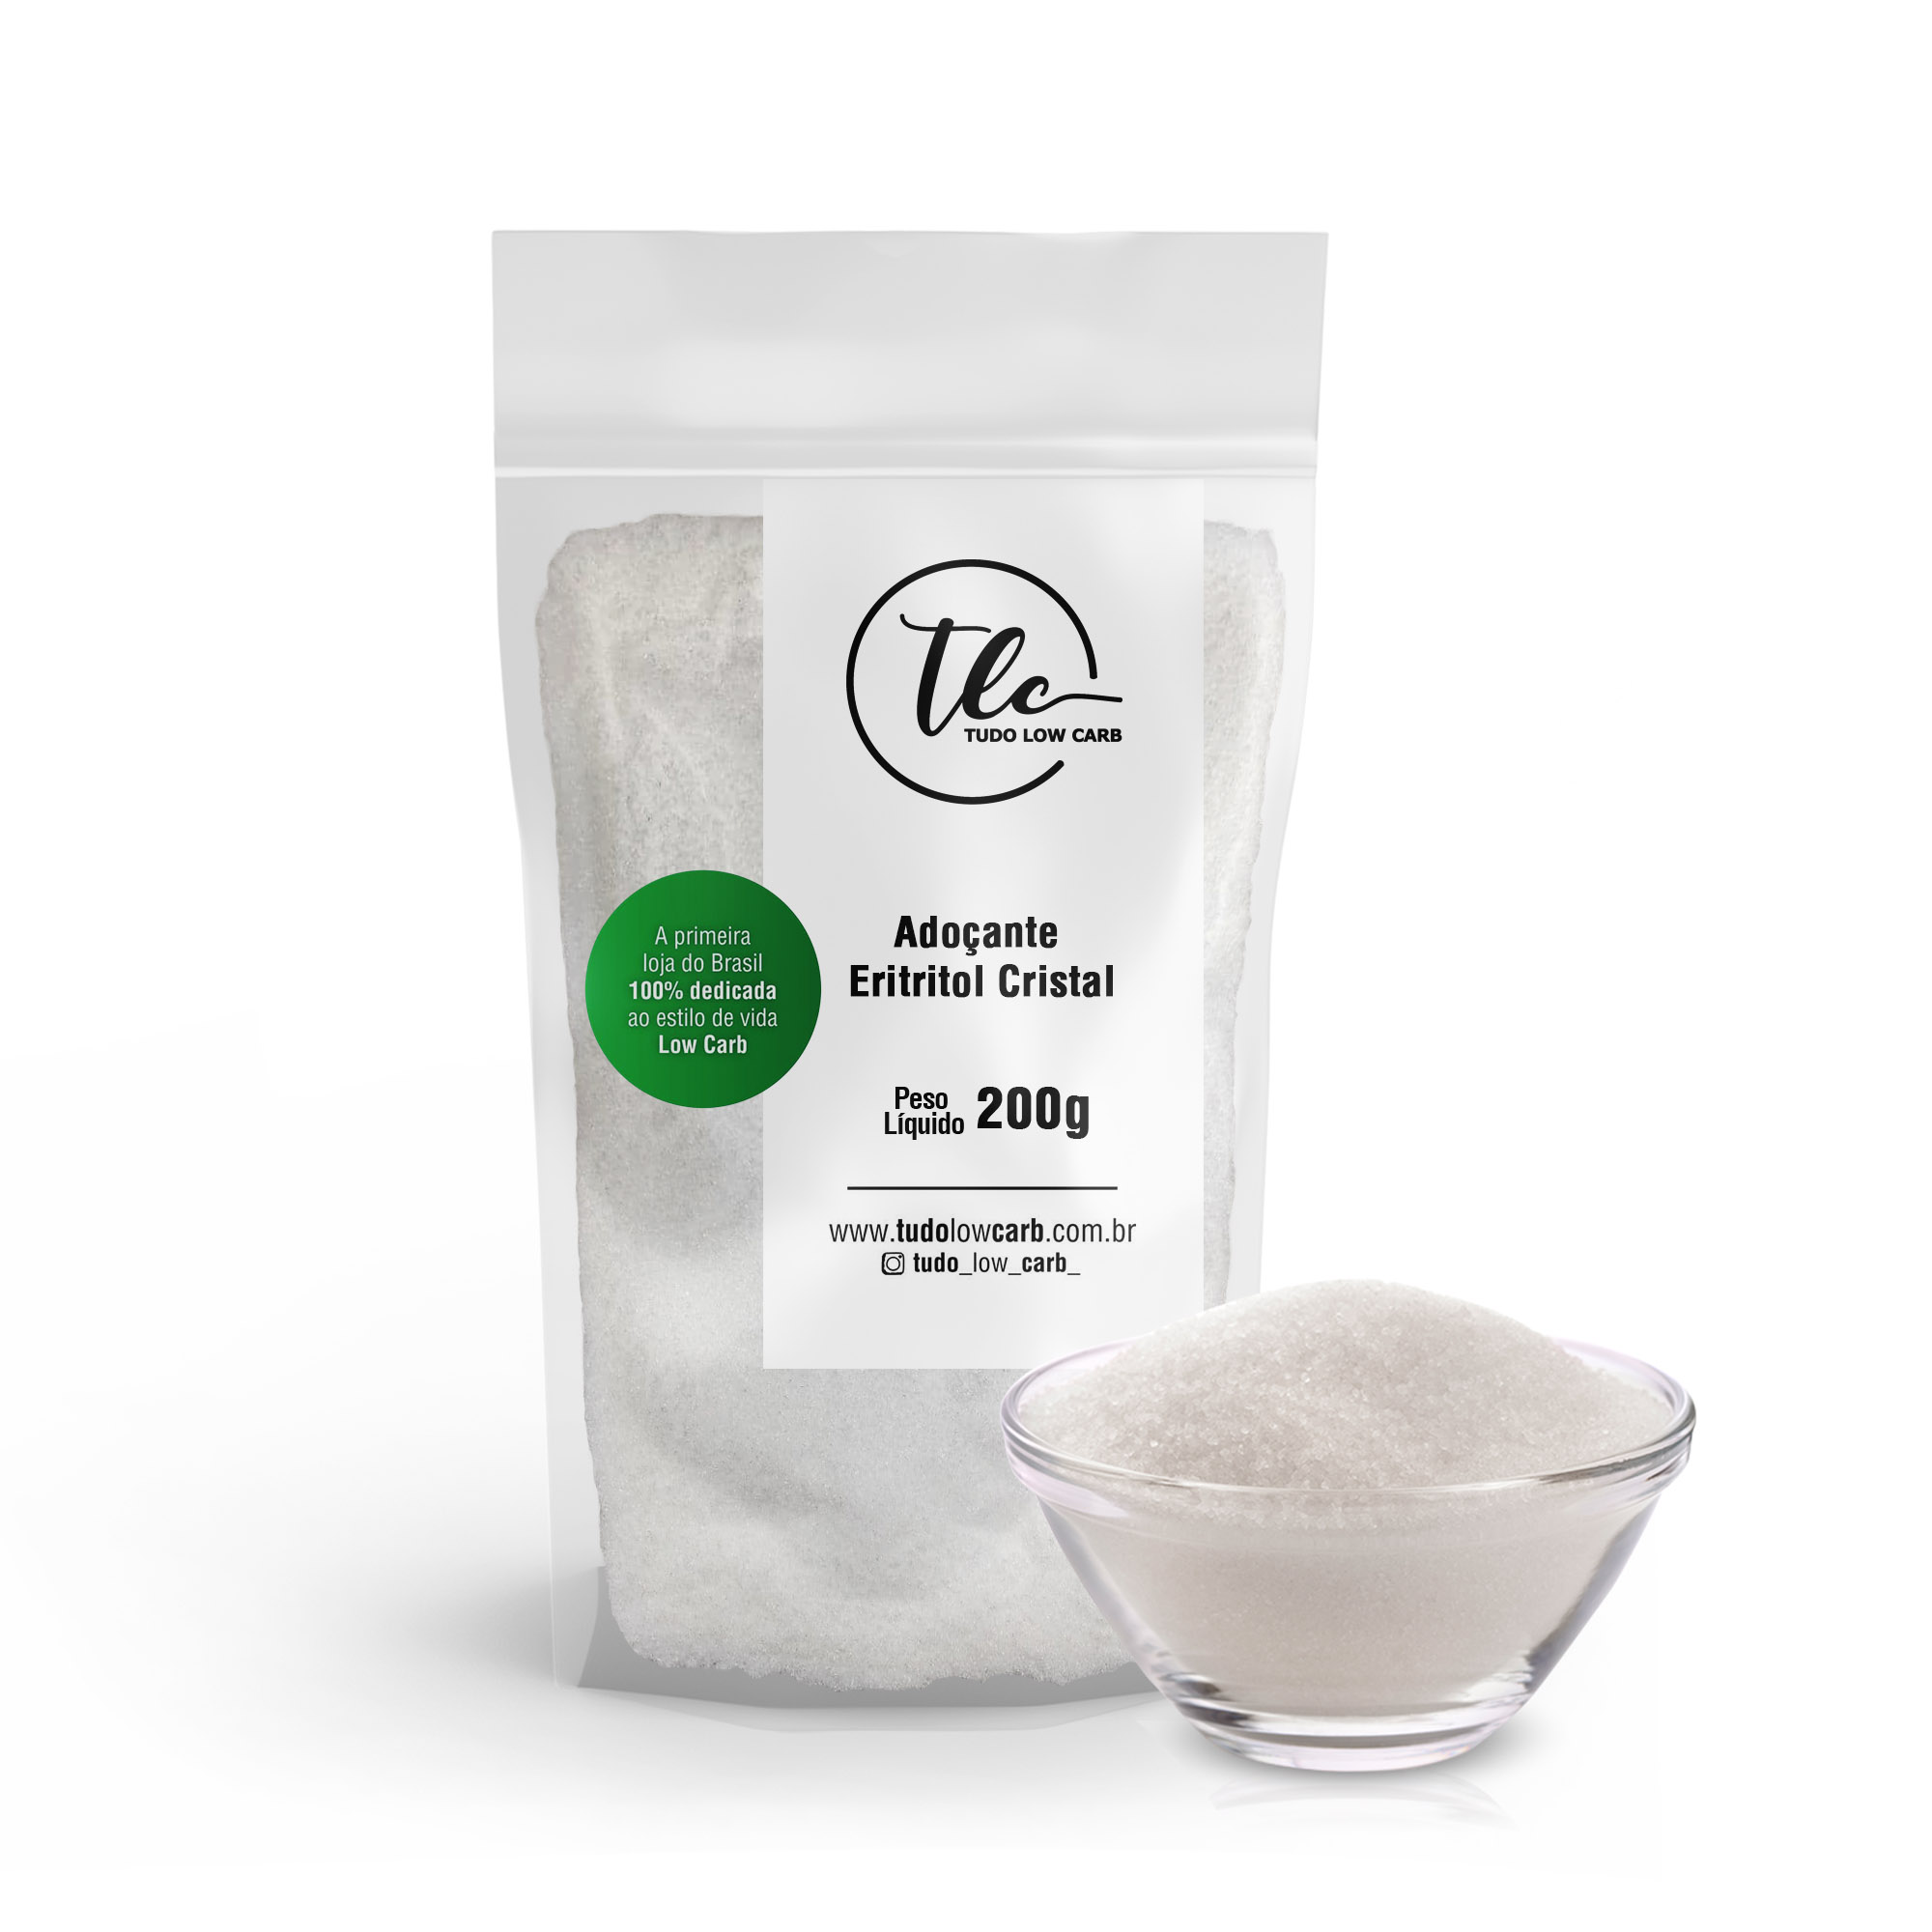 Adoçante Eritritol Cristal 200g  - TLC Tudo Low Carb